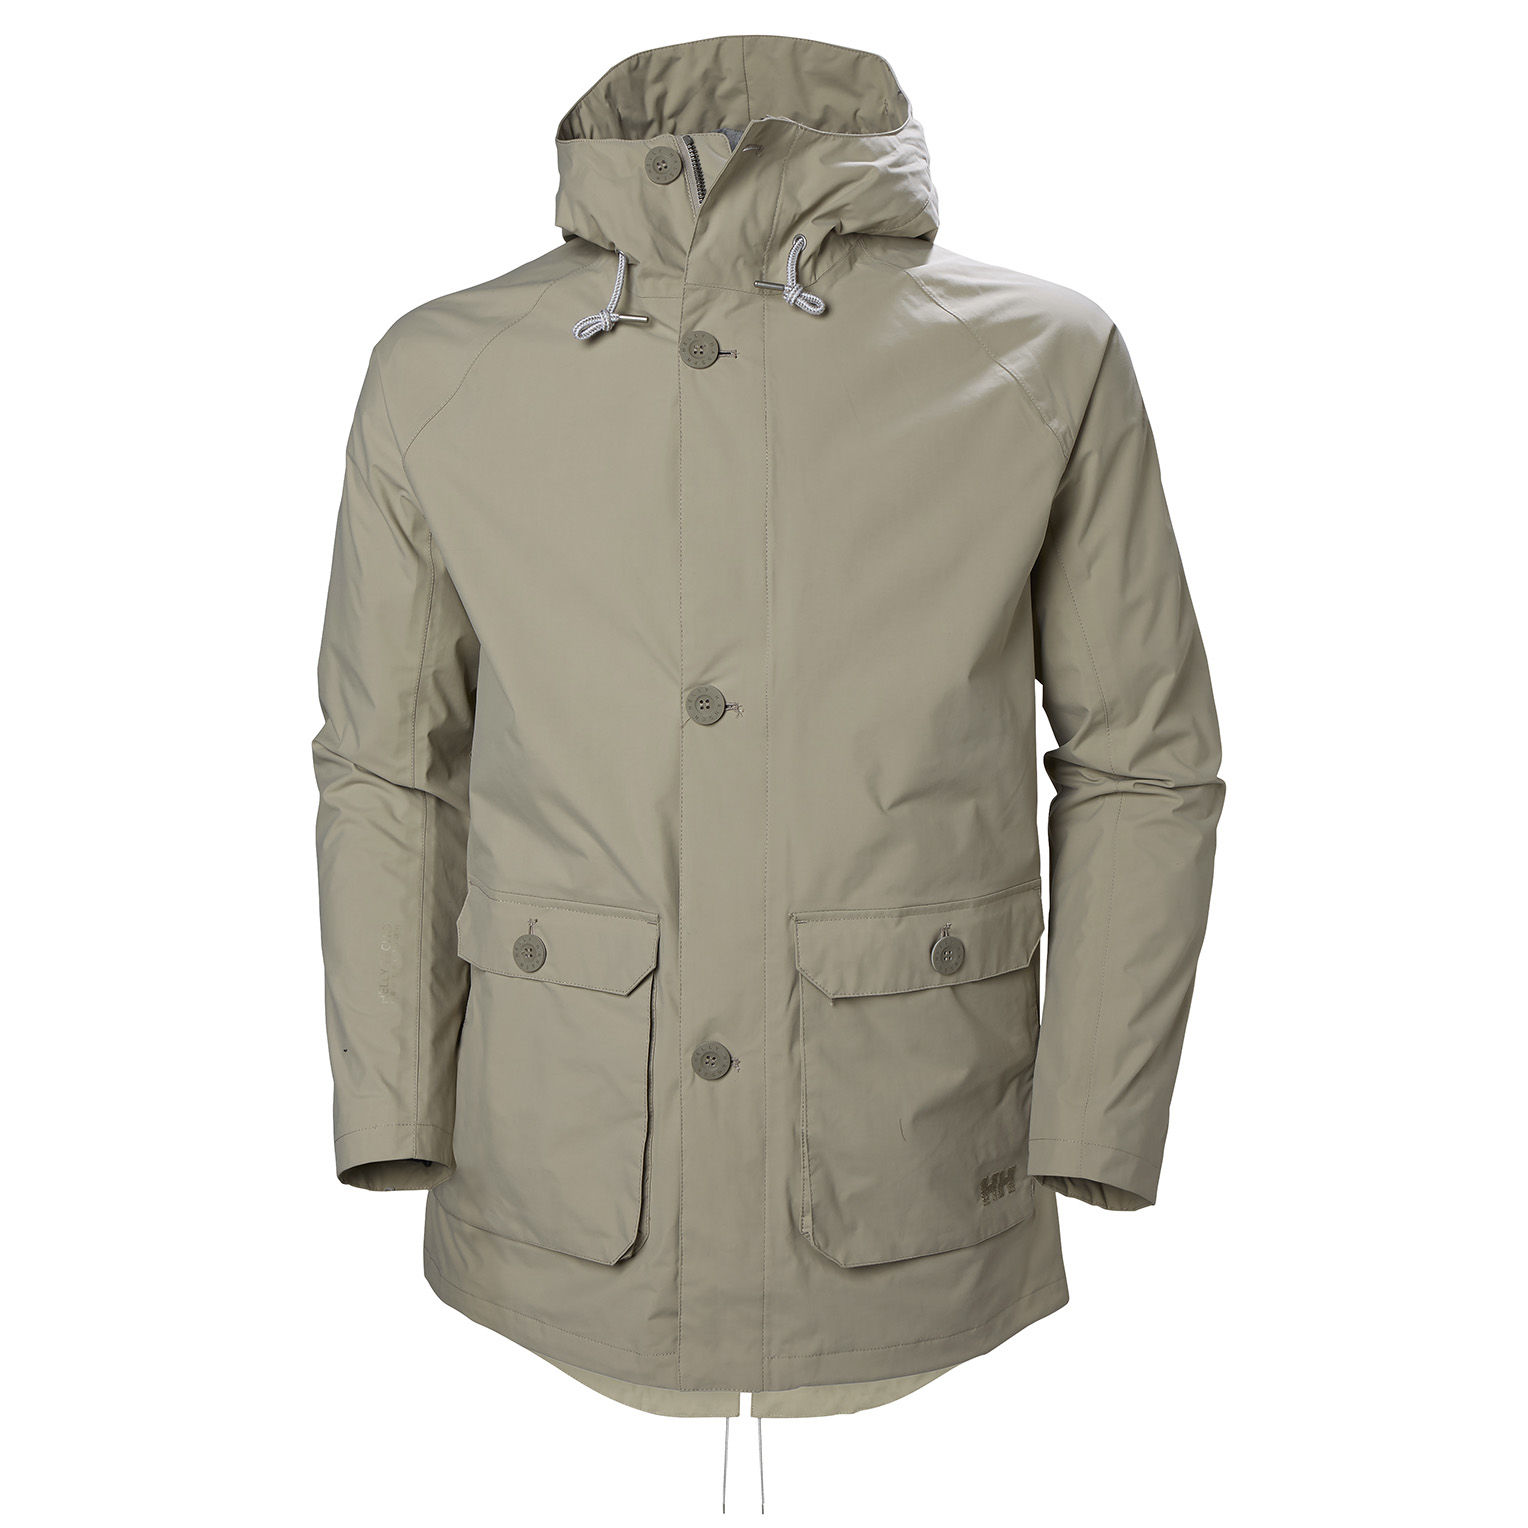 104b516d430e4 Helly Hansen Tsuyu Rain Coat - Mens, Jacket Style: Shell w/ Free Shipping —  6 models